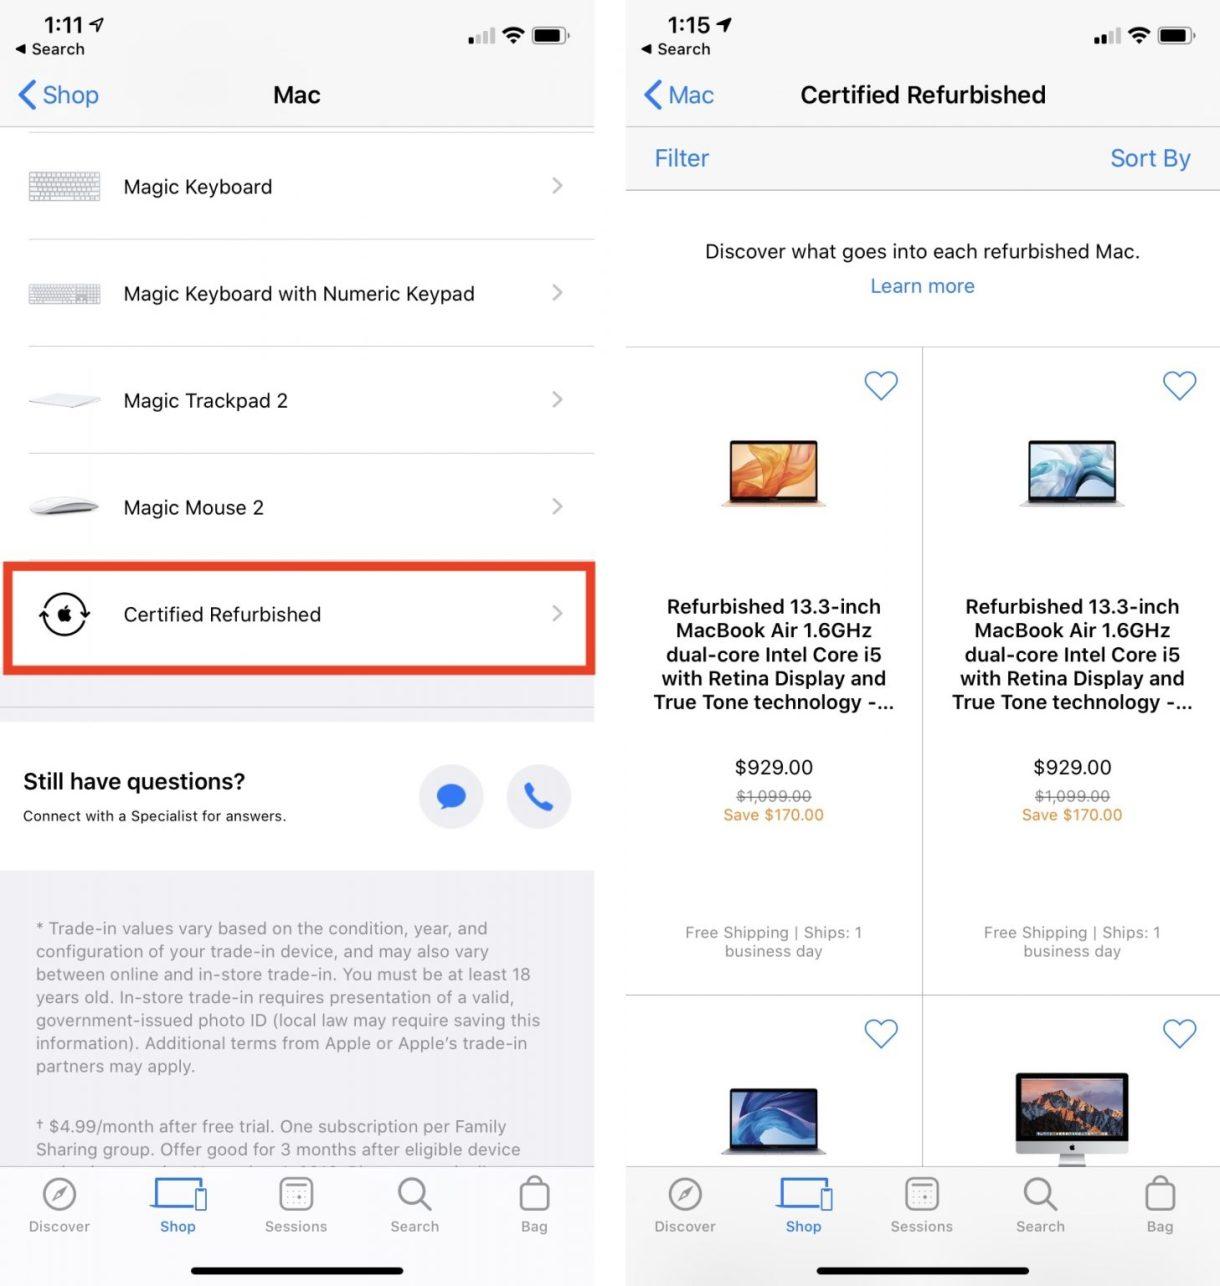 apple store refurb 1457x1536 - منتجات آبل المجددة أفضل طريقة لتوفير المال إذا فاتتك عروض البلاك فرايداي